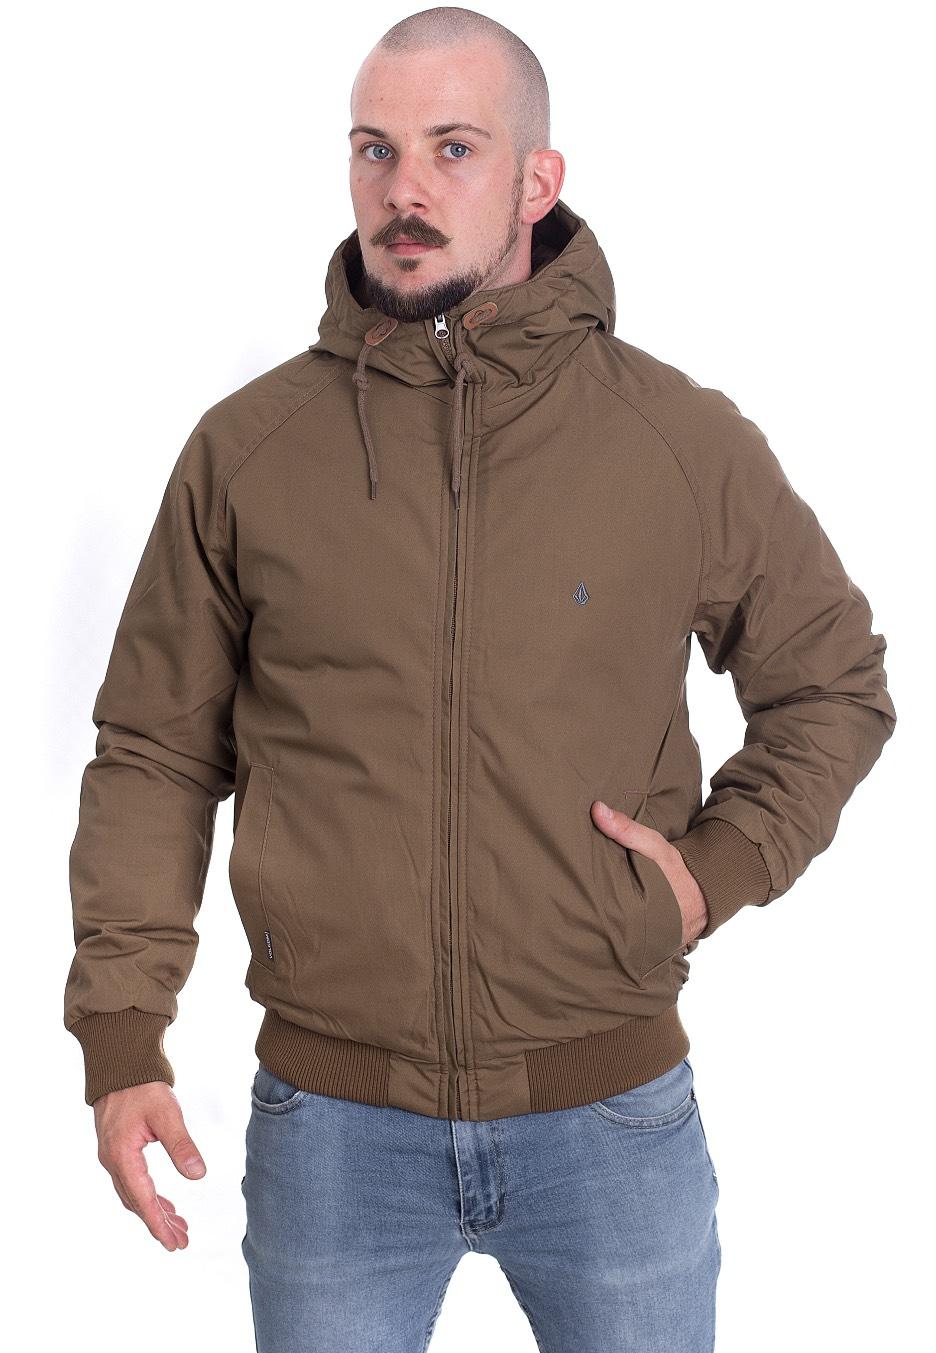 727fb86b7f5a Volcom - Hernan Mud - Jacket - Streetwear Shop - Impericon.com US